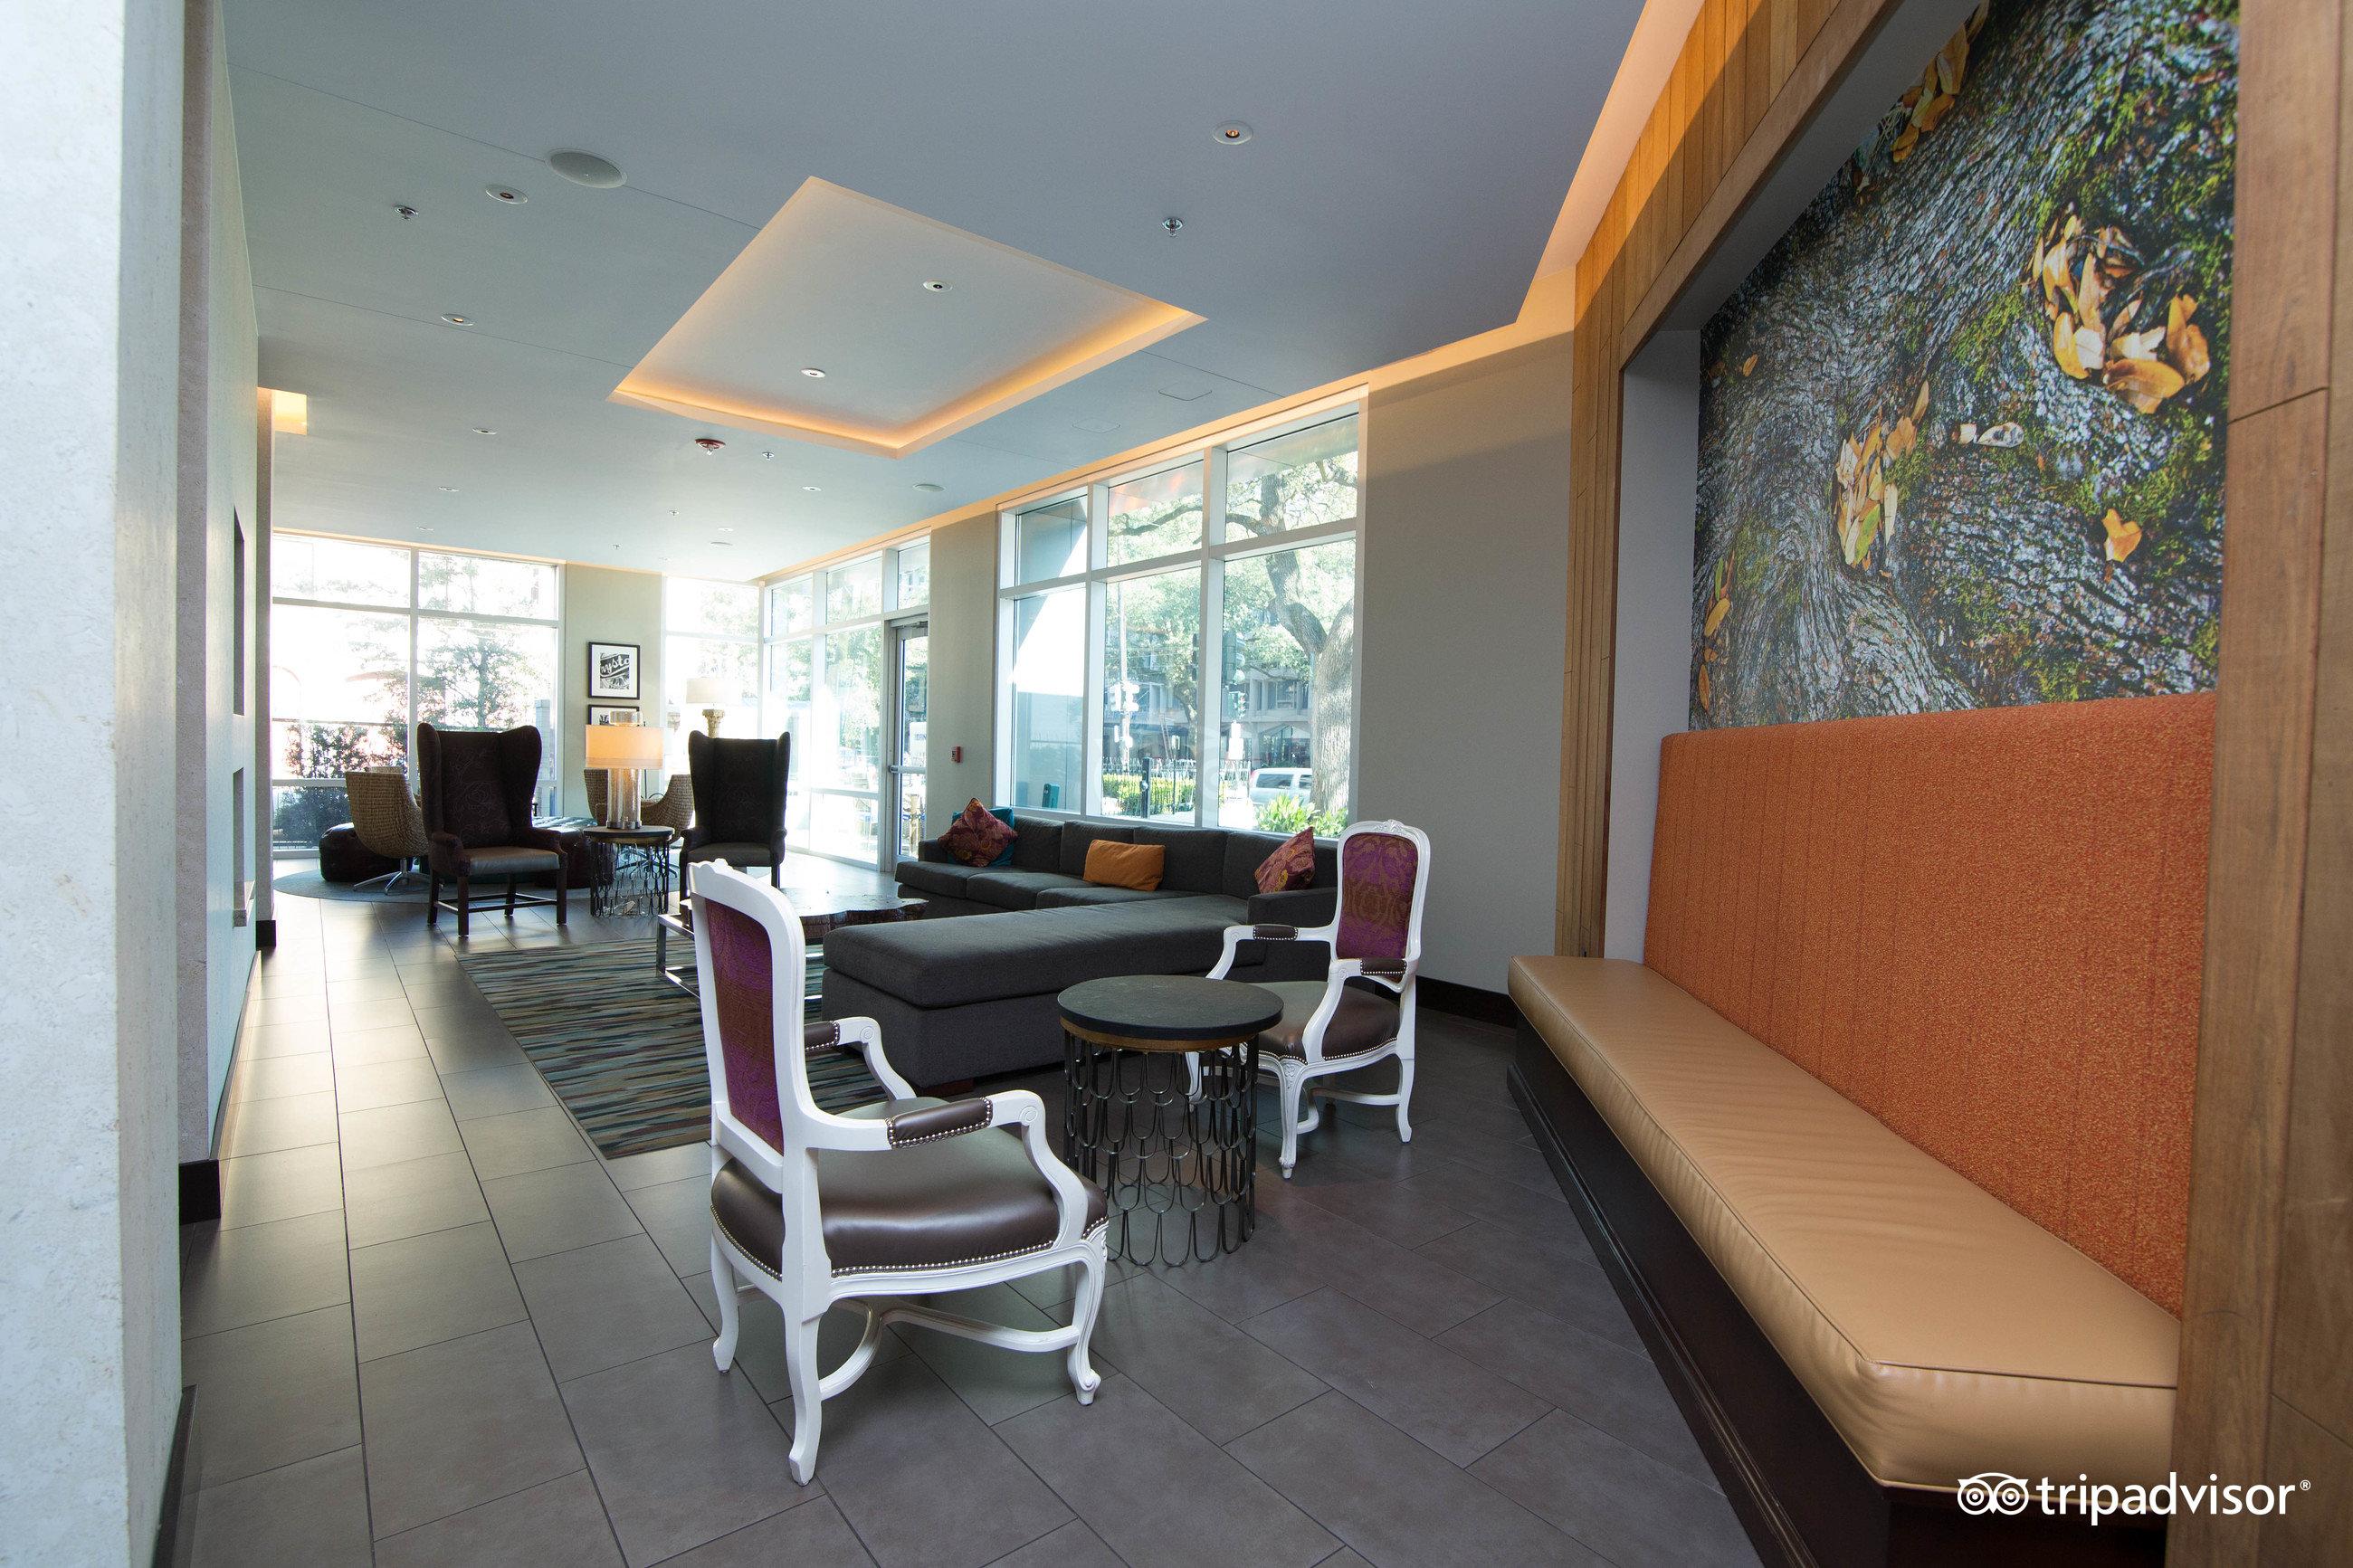 hotel indigo new orleans garden district la 2018 review